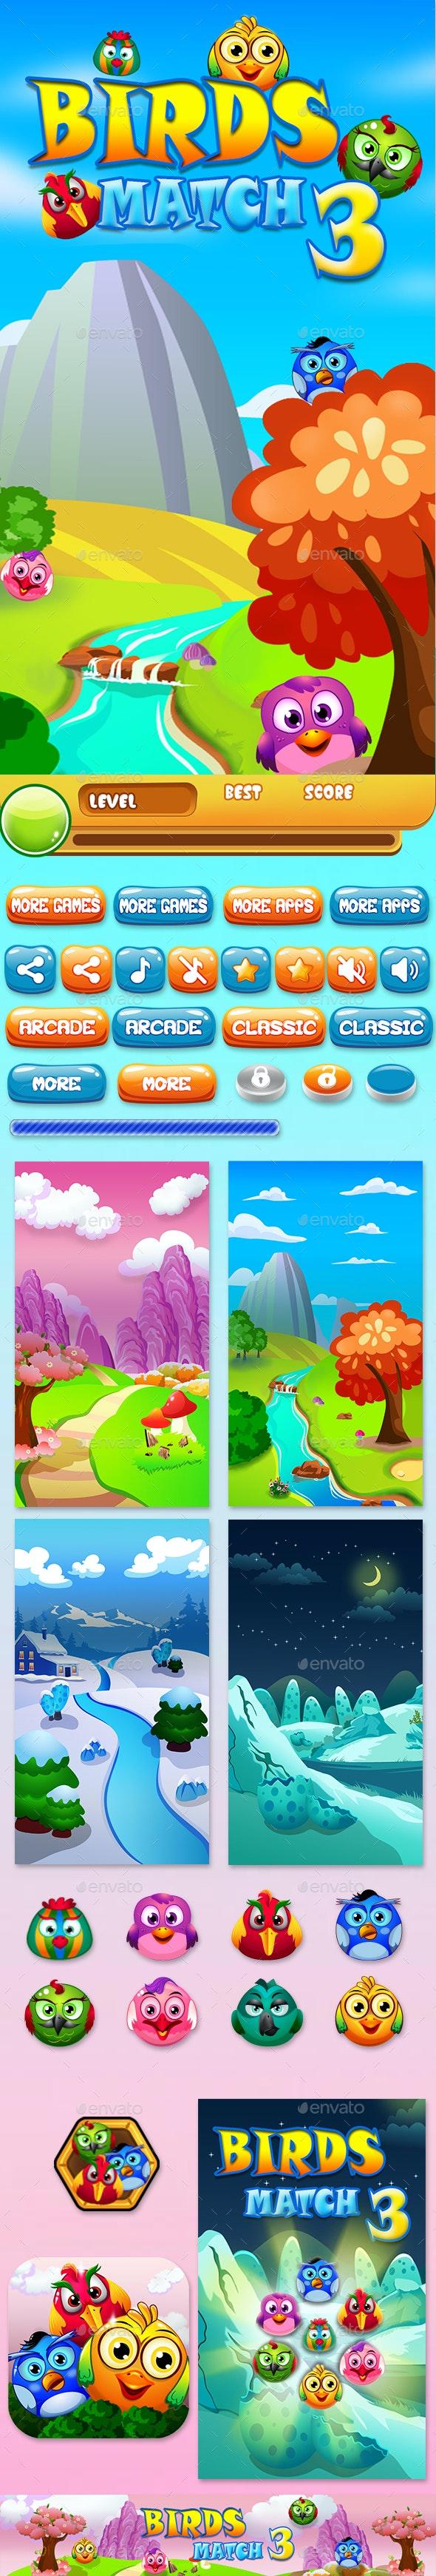 Match 3 Unity Asset Reskin: Birds - Game Kits Game Assets